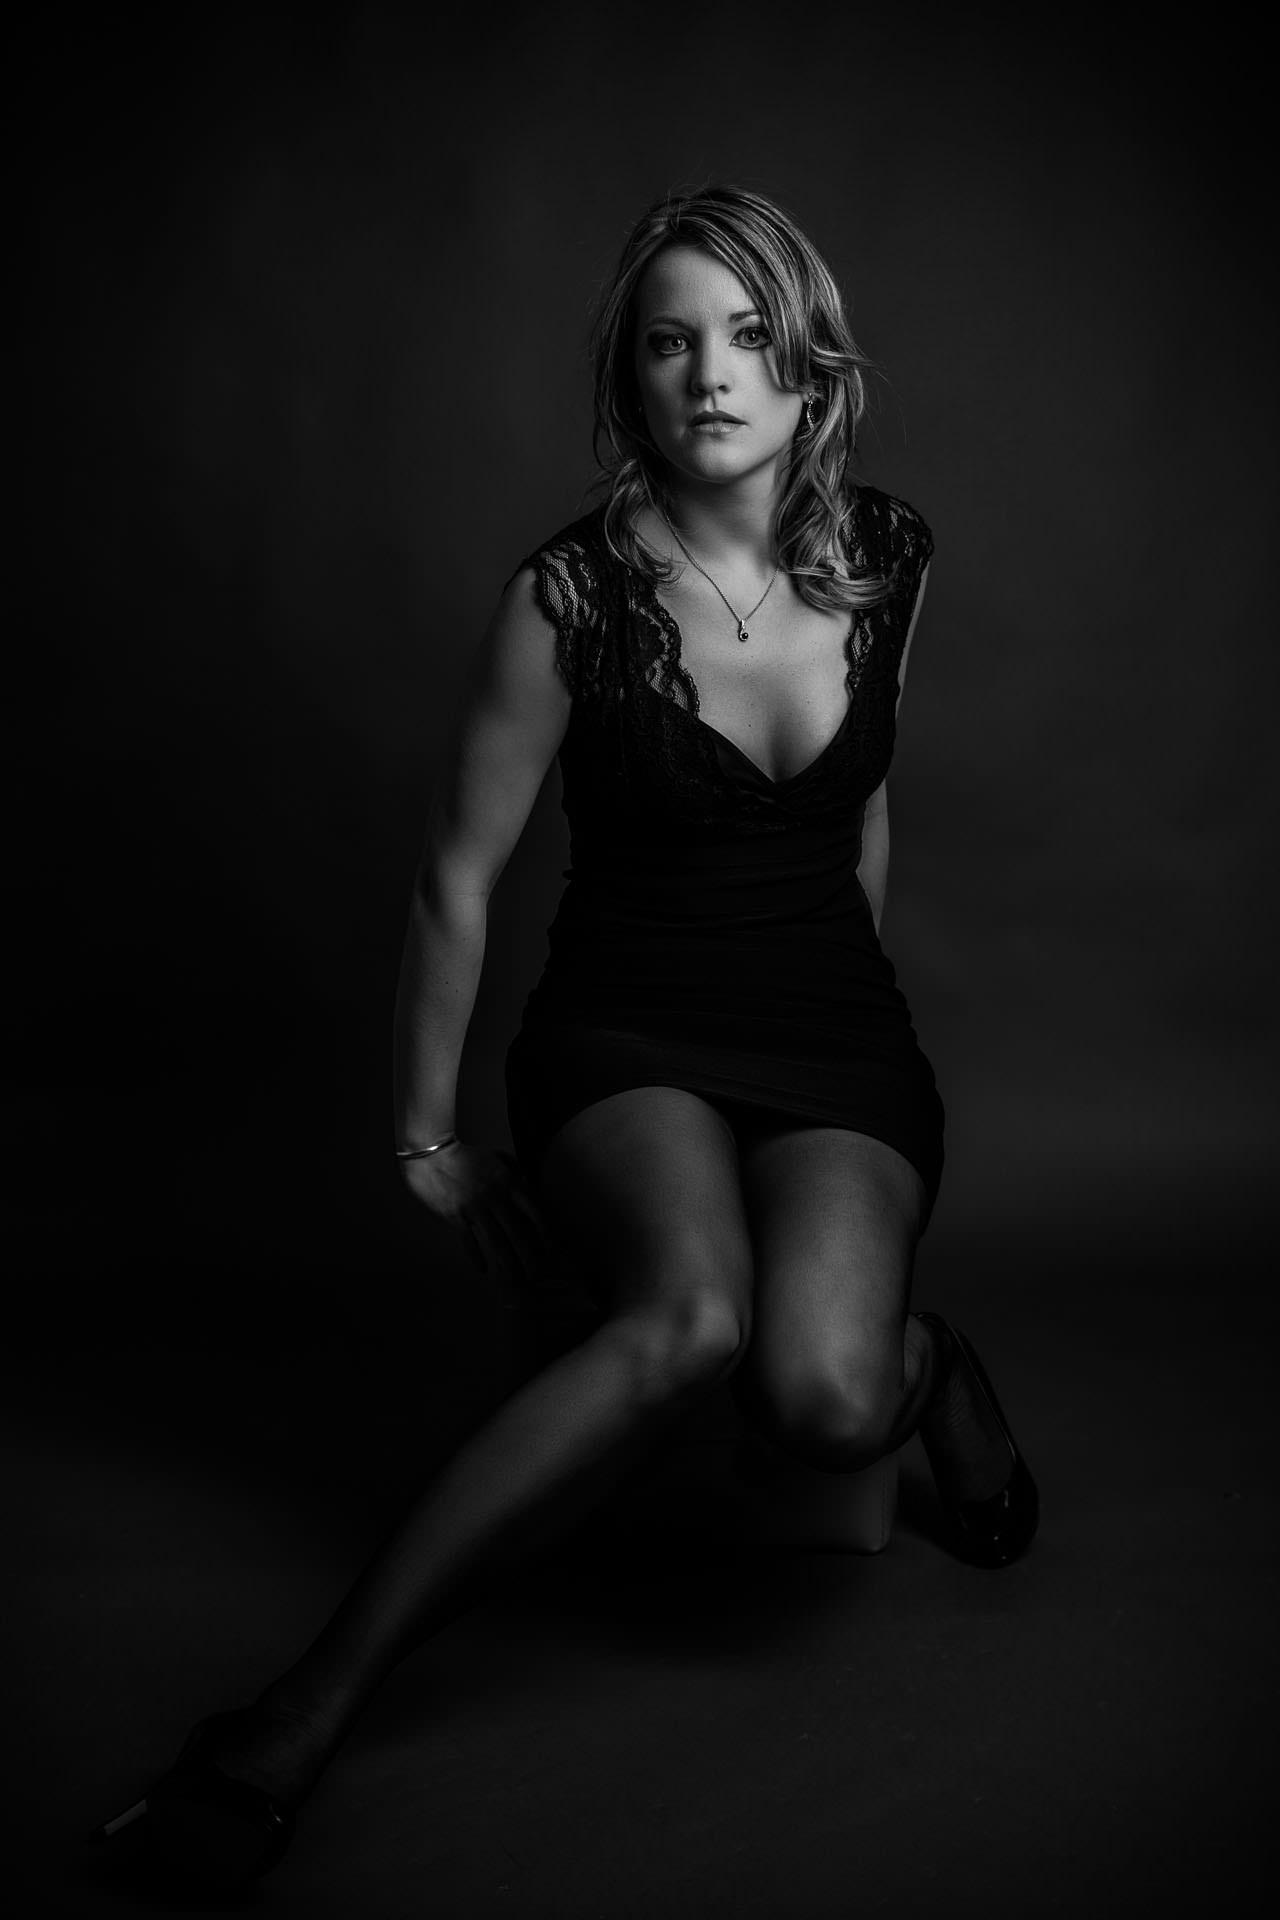 2013-11-29 - Christelle - Studio Jouy - 4331 - 1920px